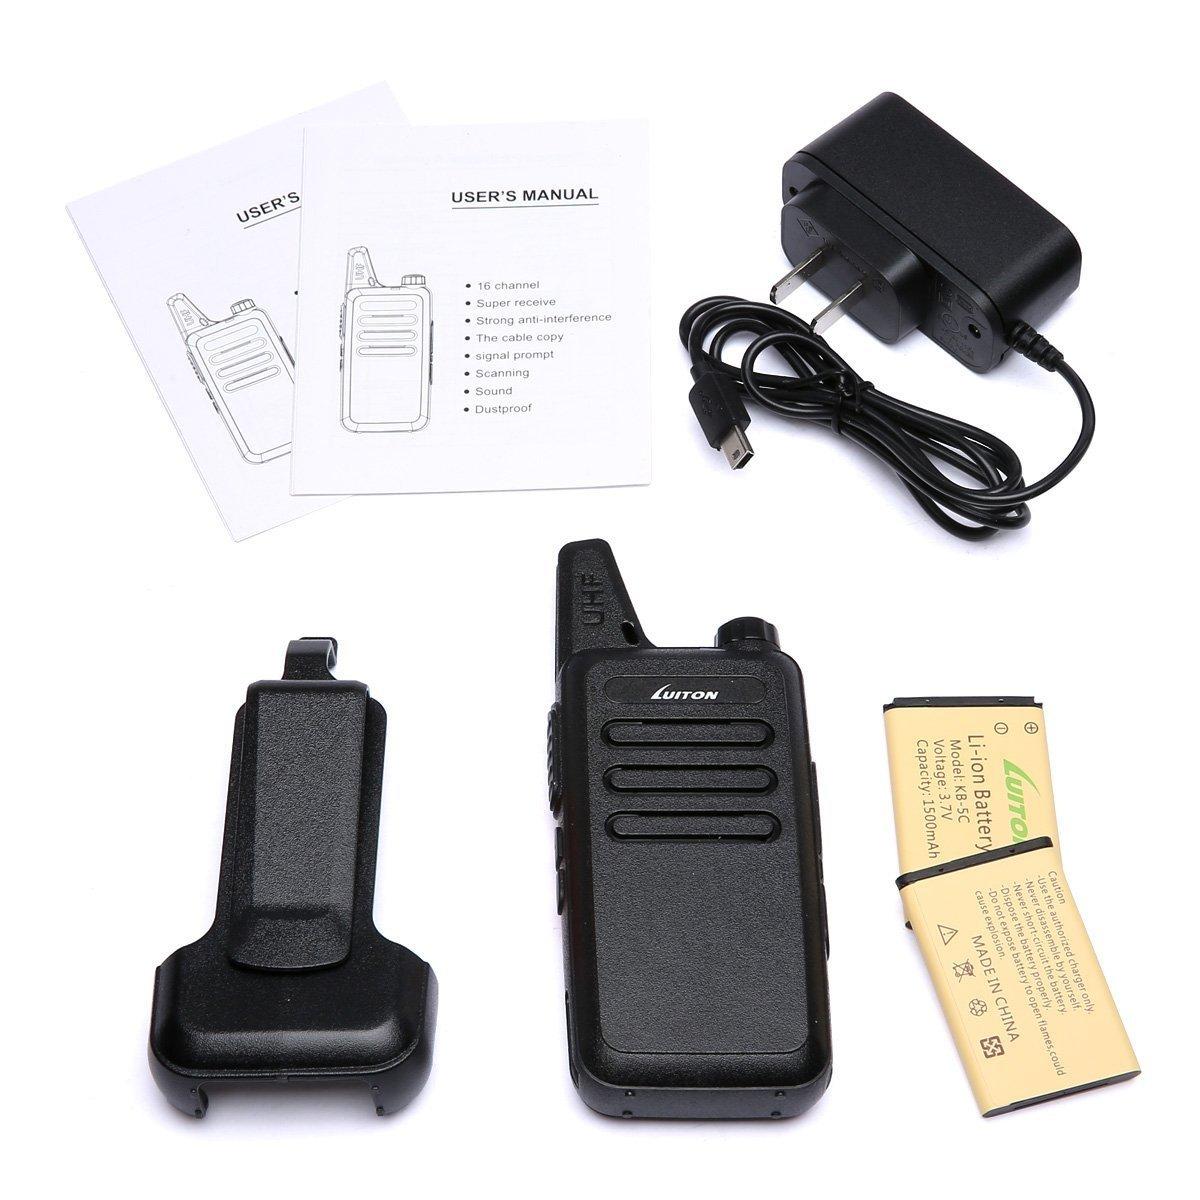 Amazon.com: UHF Walkie Talkies Car Electronics Two-Way Radios For Car  Rechargeable Long Range Outdoor Hiking Hunting UHF Walkie Talkies USB  Charging Amateur ...